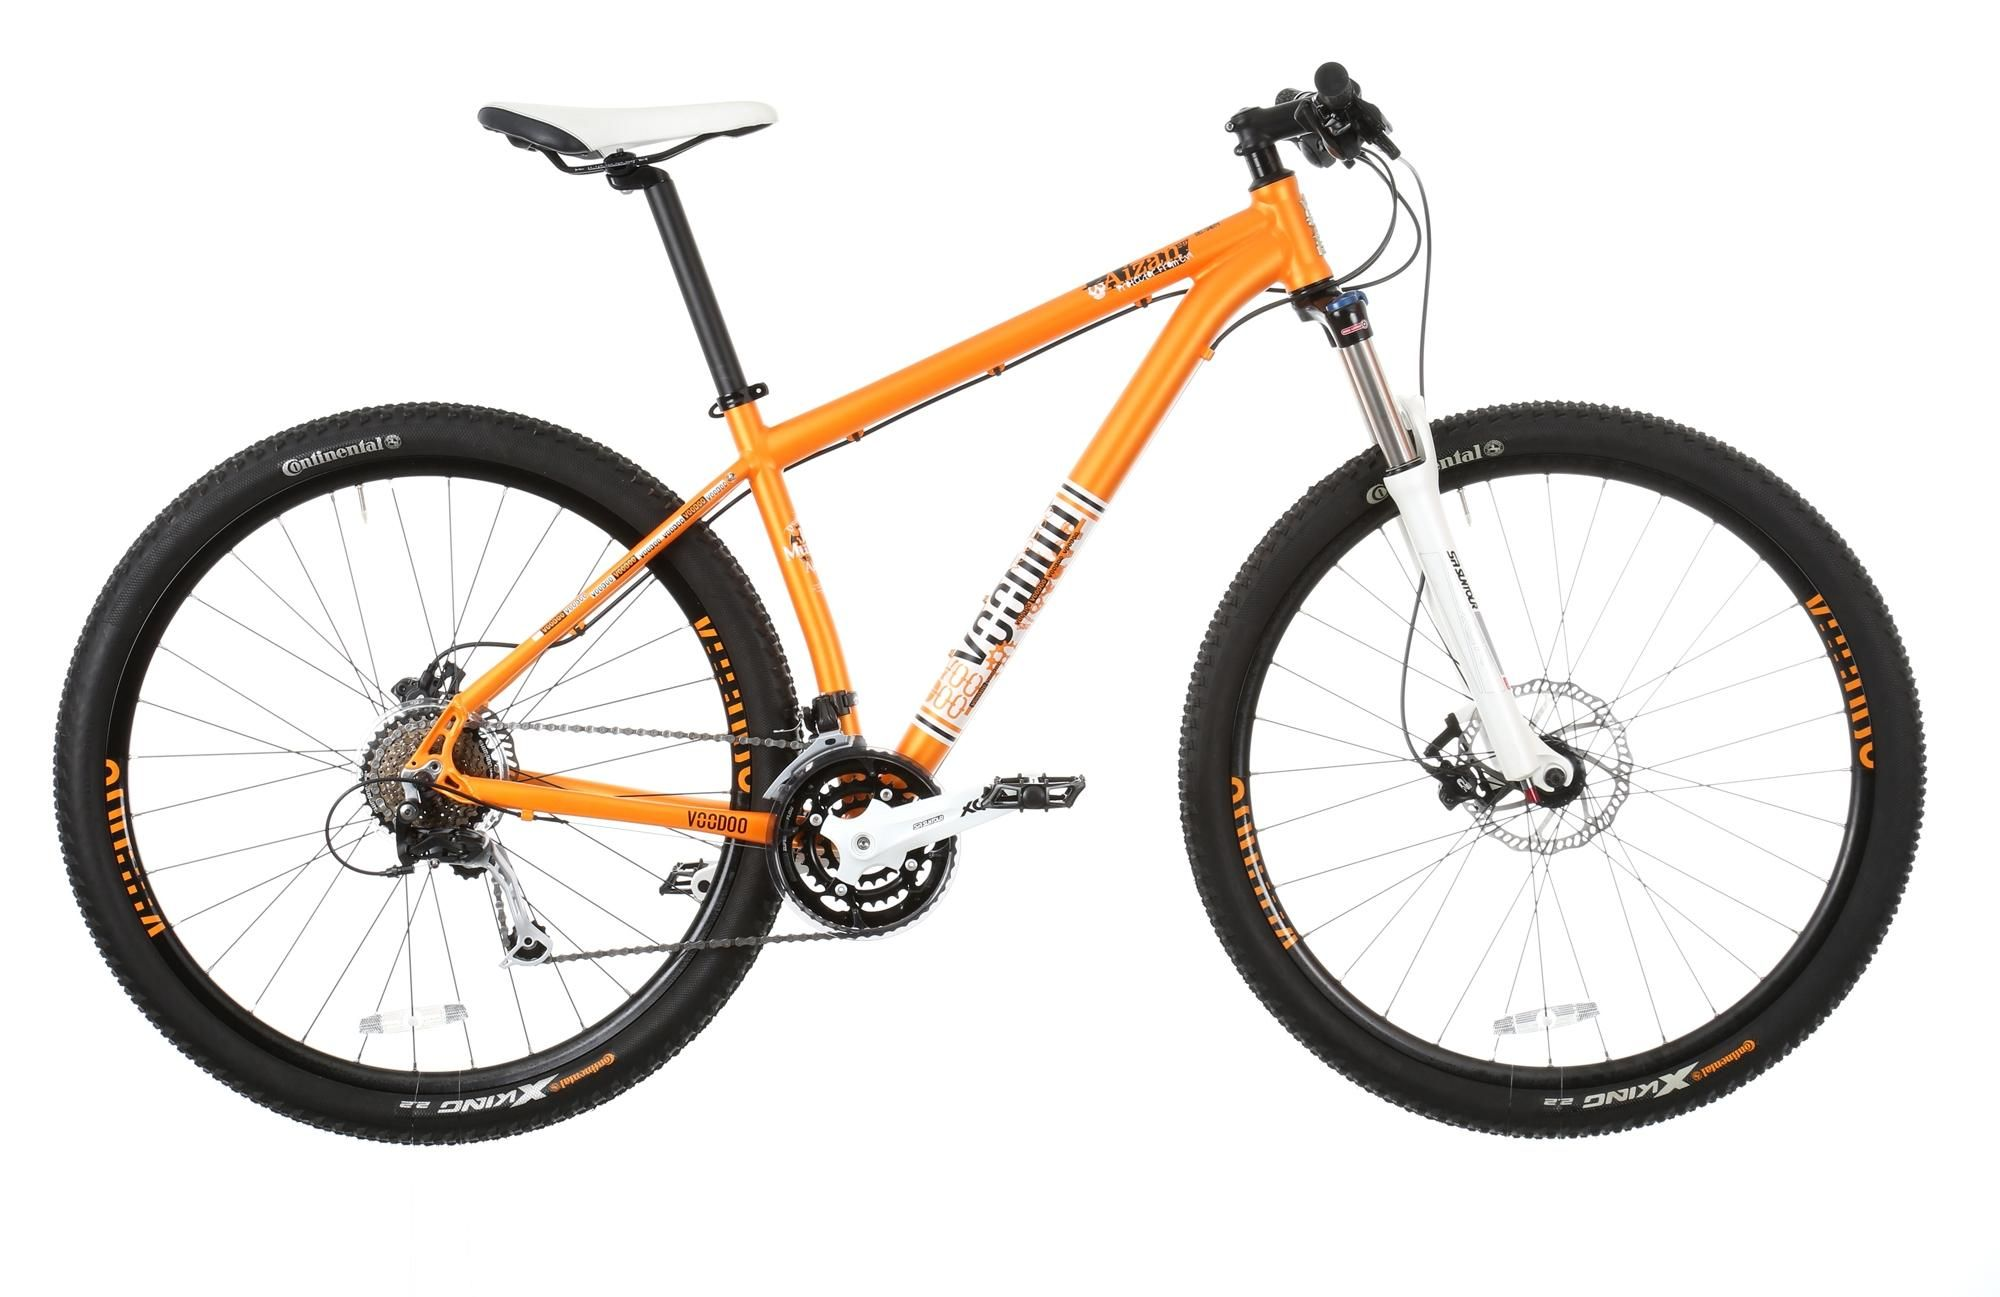 Voodoo Aizan 29er Mountain Bike 18inch Has 29er Geometry Alongside